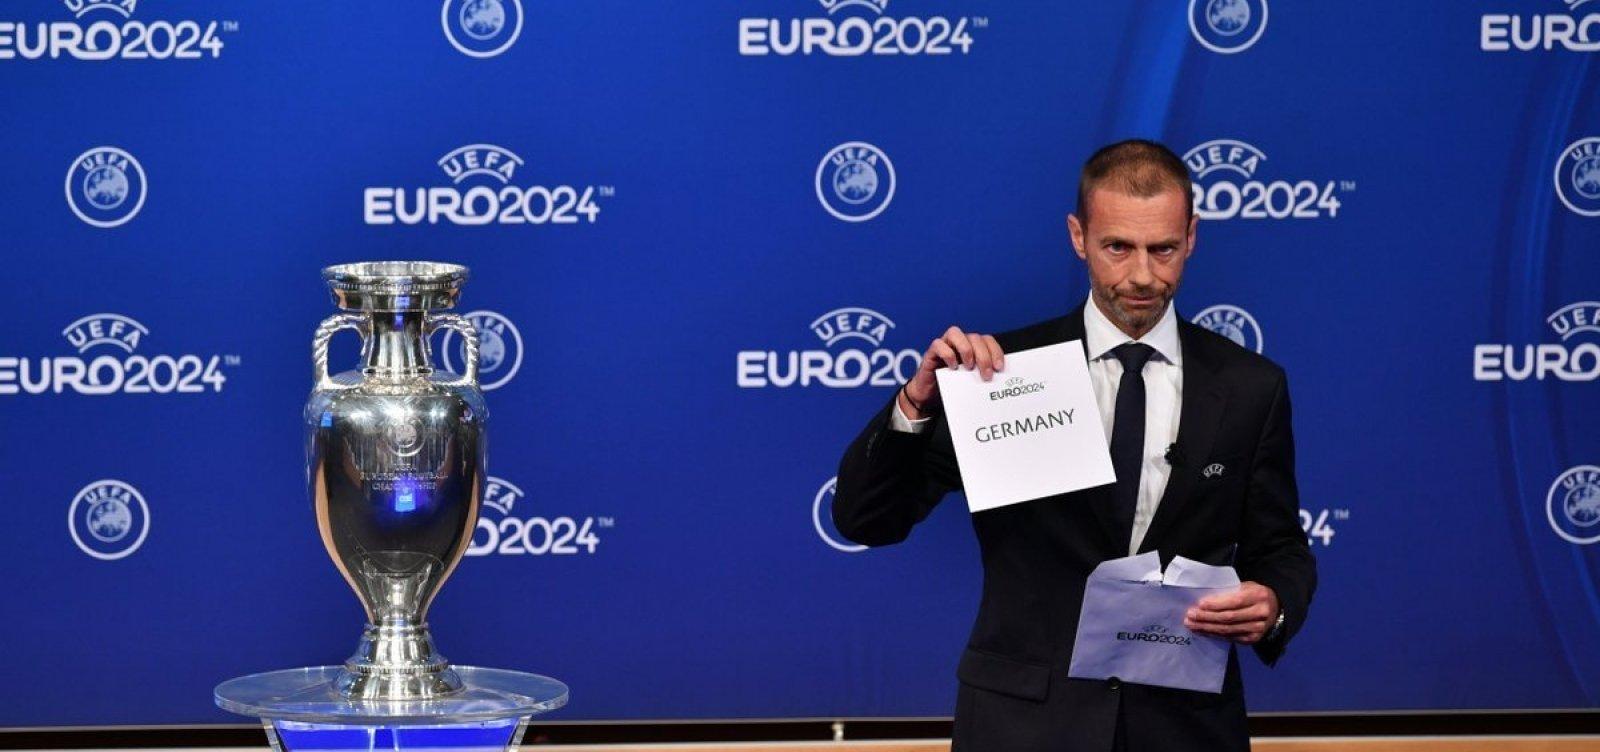 [Alemanha é escolhida como sede da Eurocopa 2024]